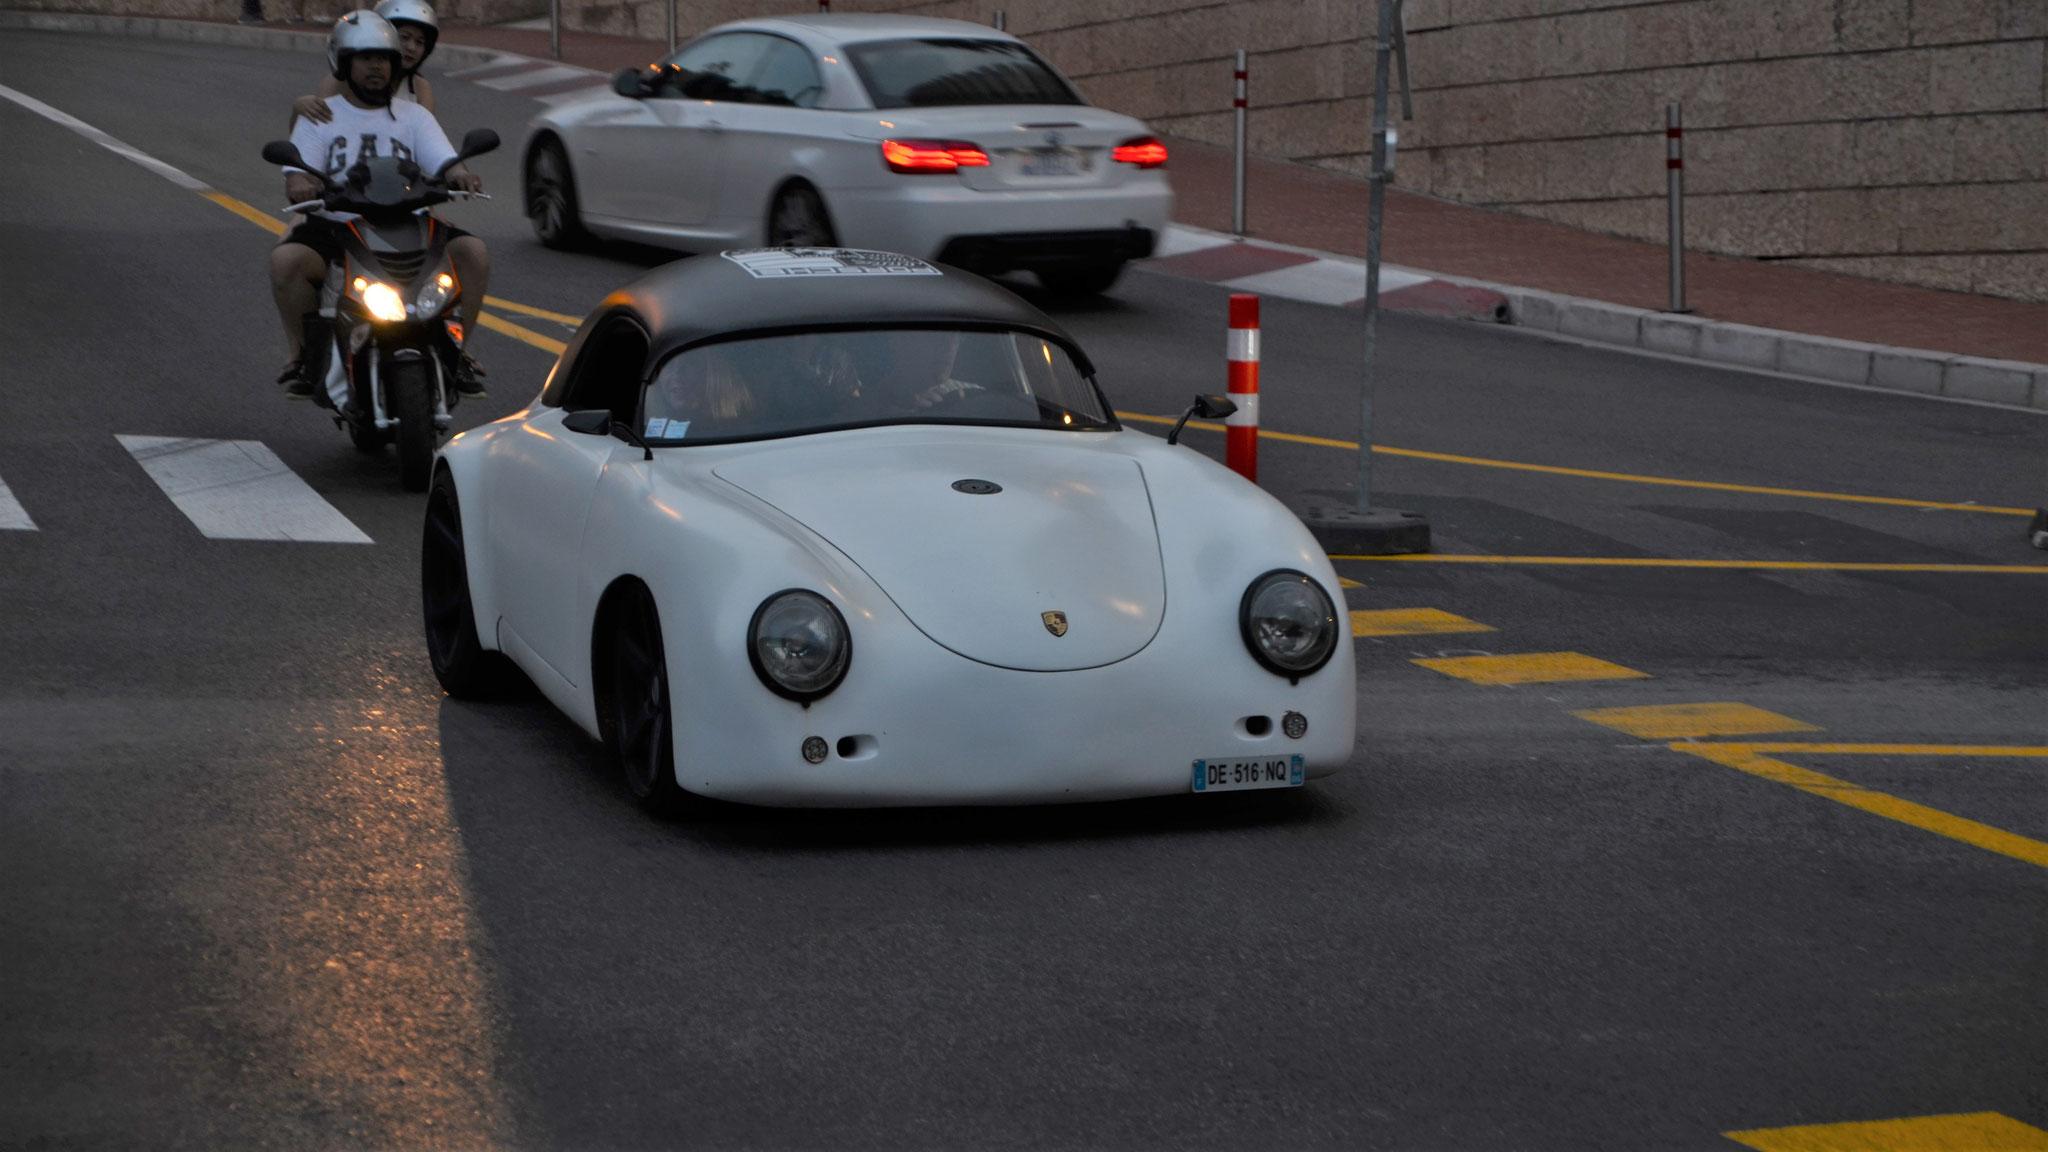 Porsche 356 Custom - DE-516-NQ-06 (FRA)